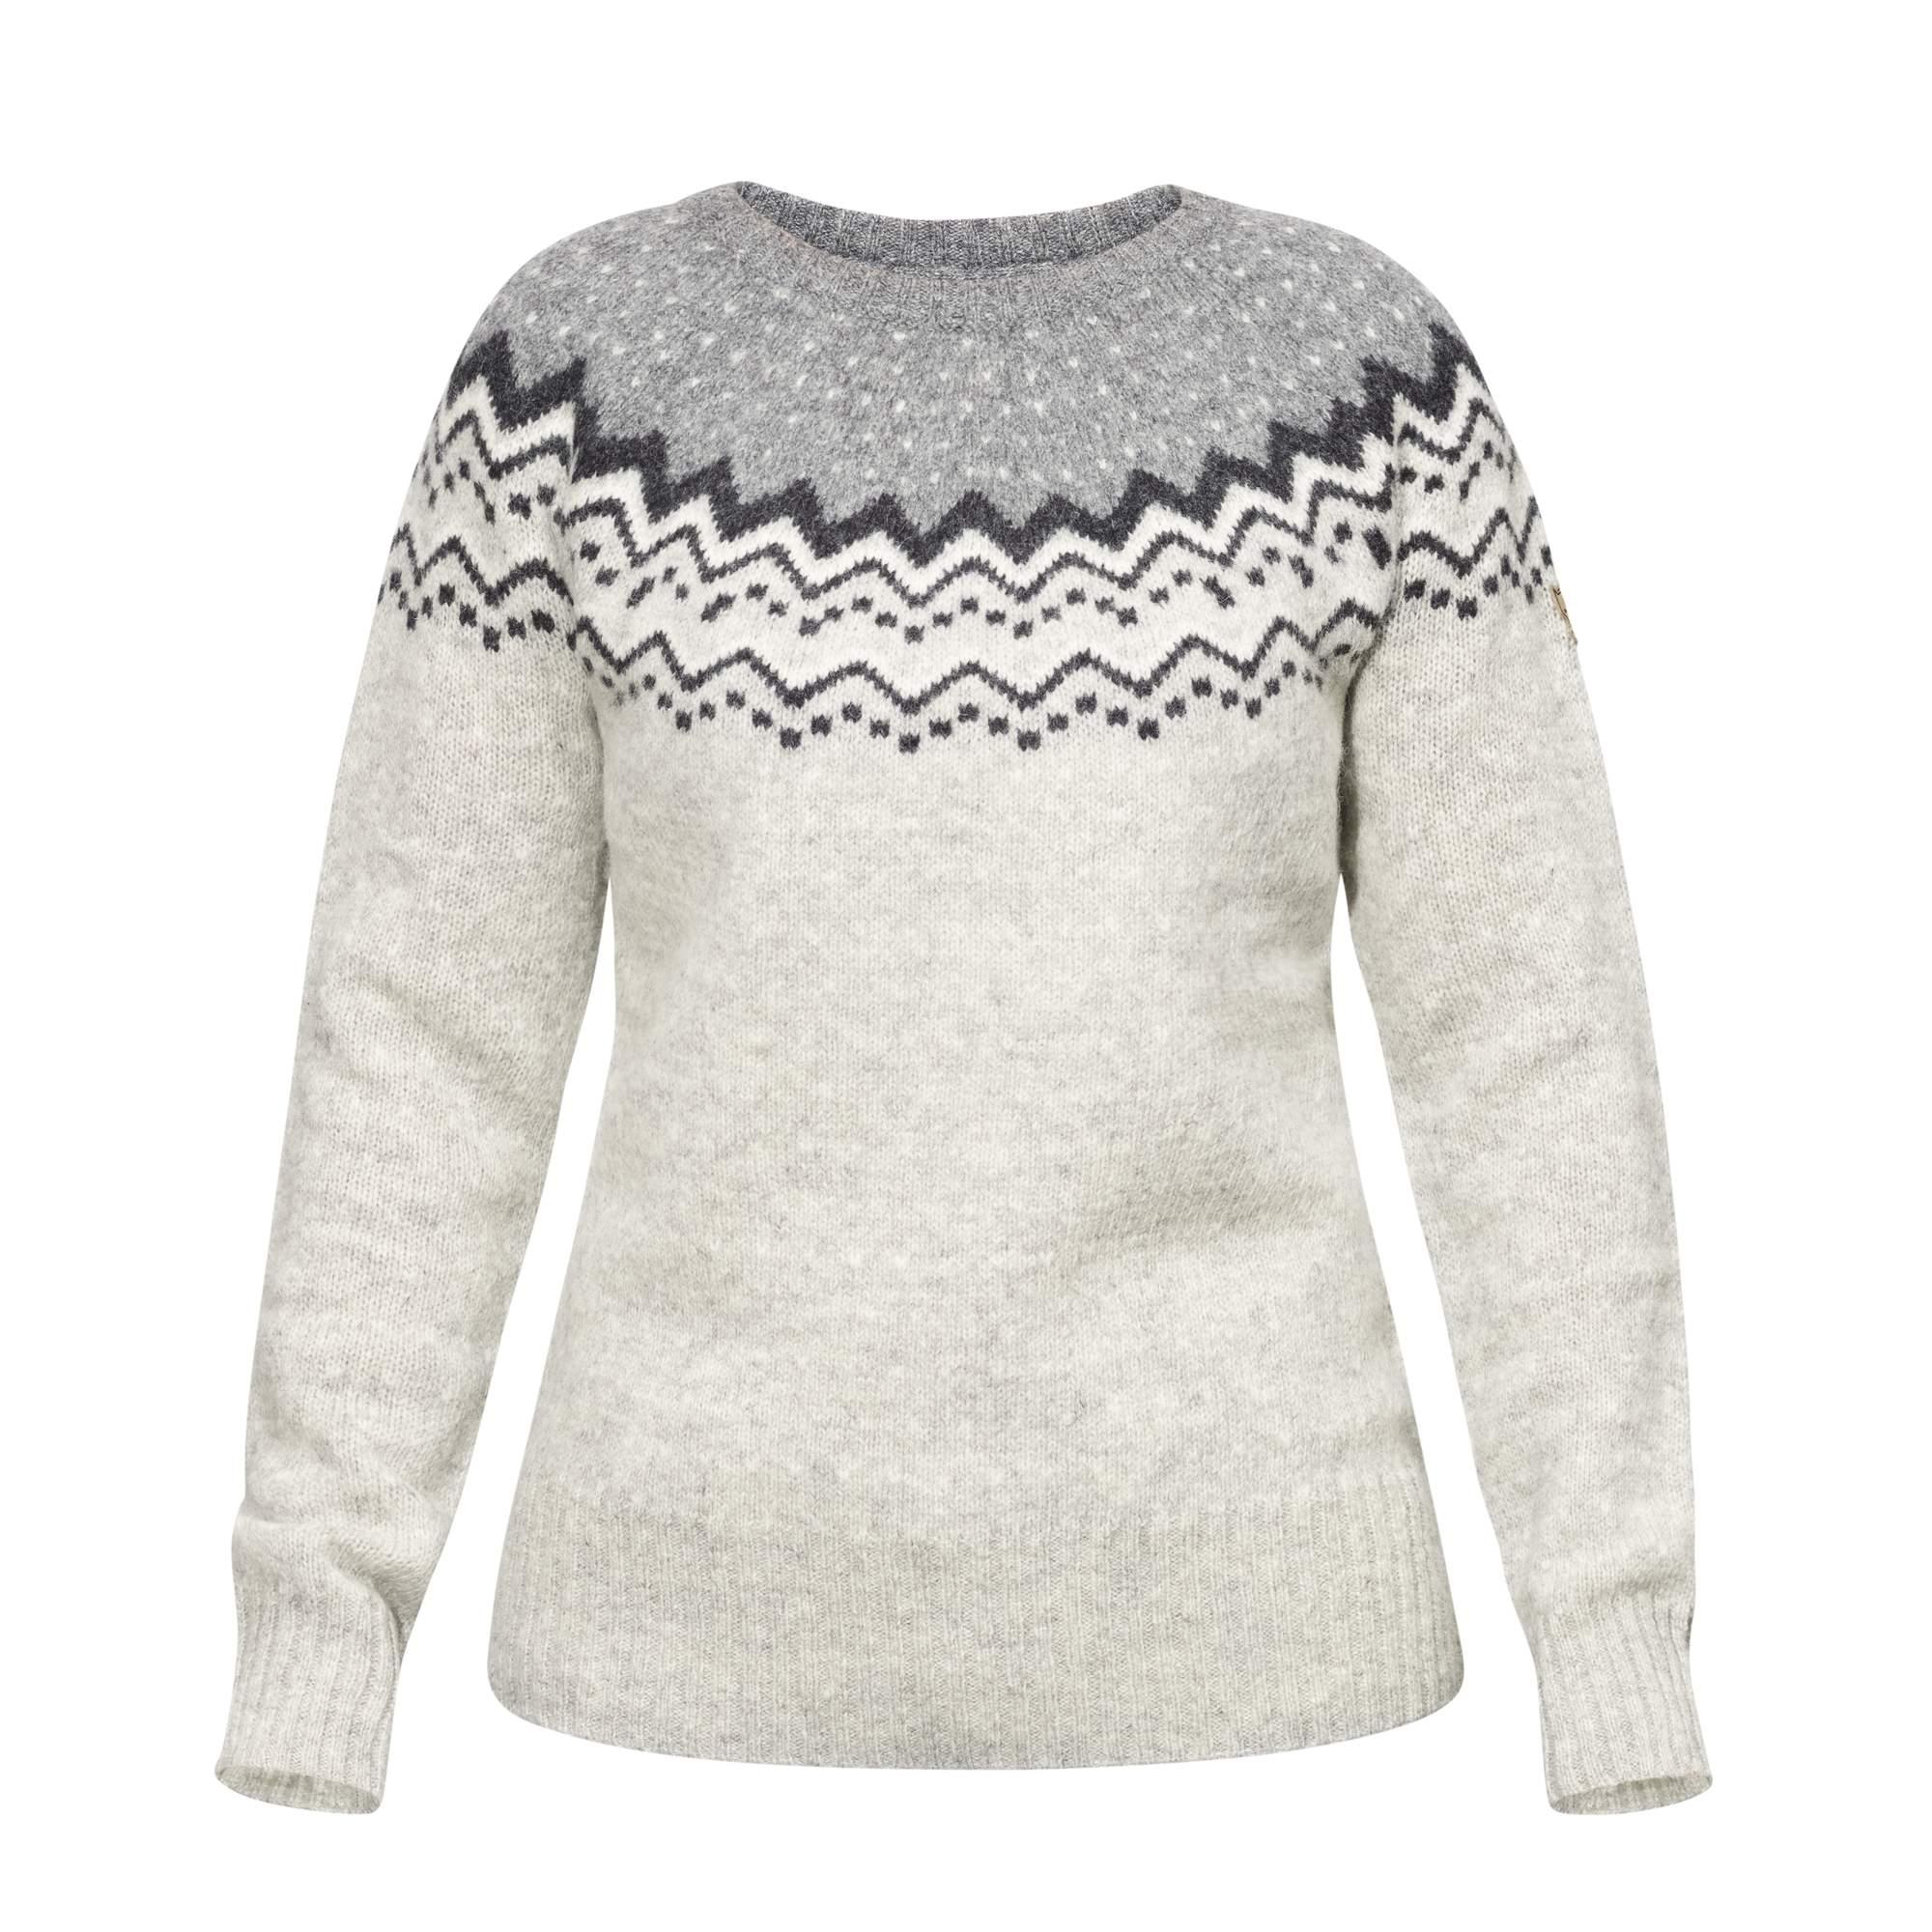 7323450281458_FW18_a_oevik_knit_sweater_w_21.jpg